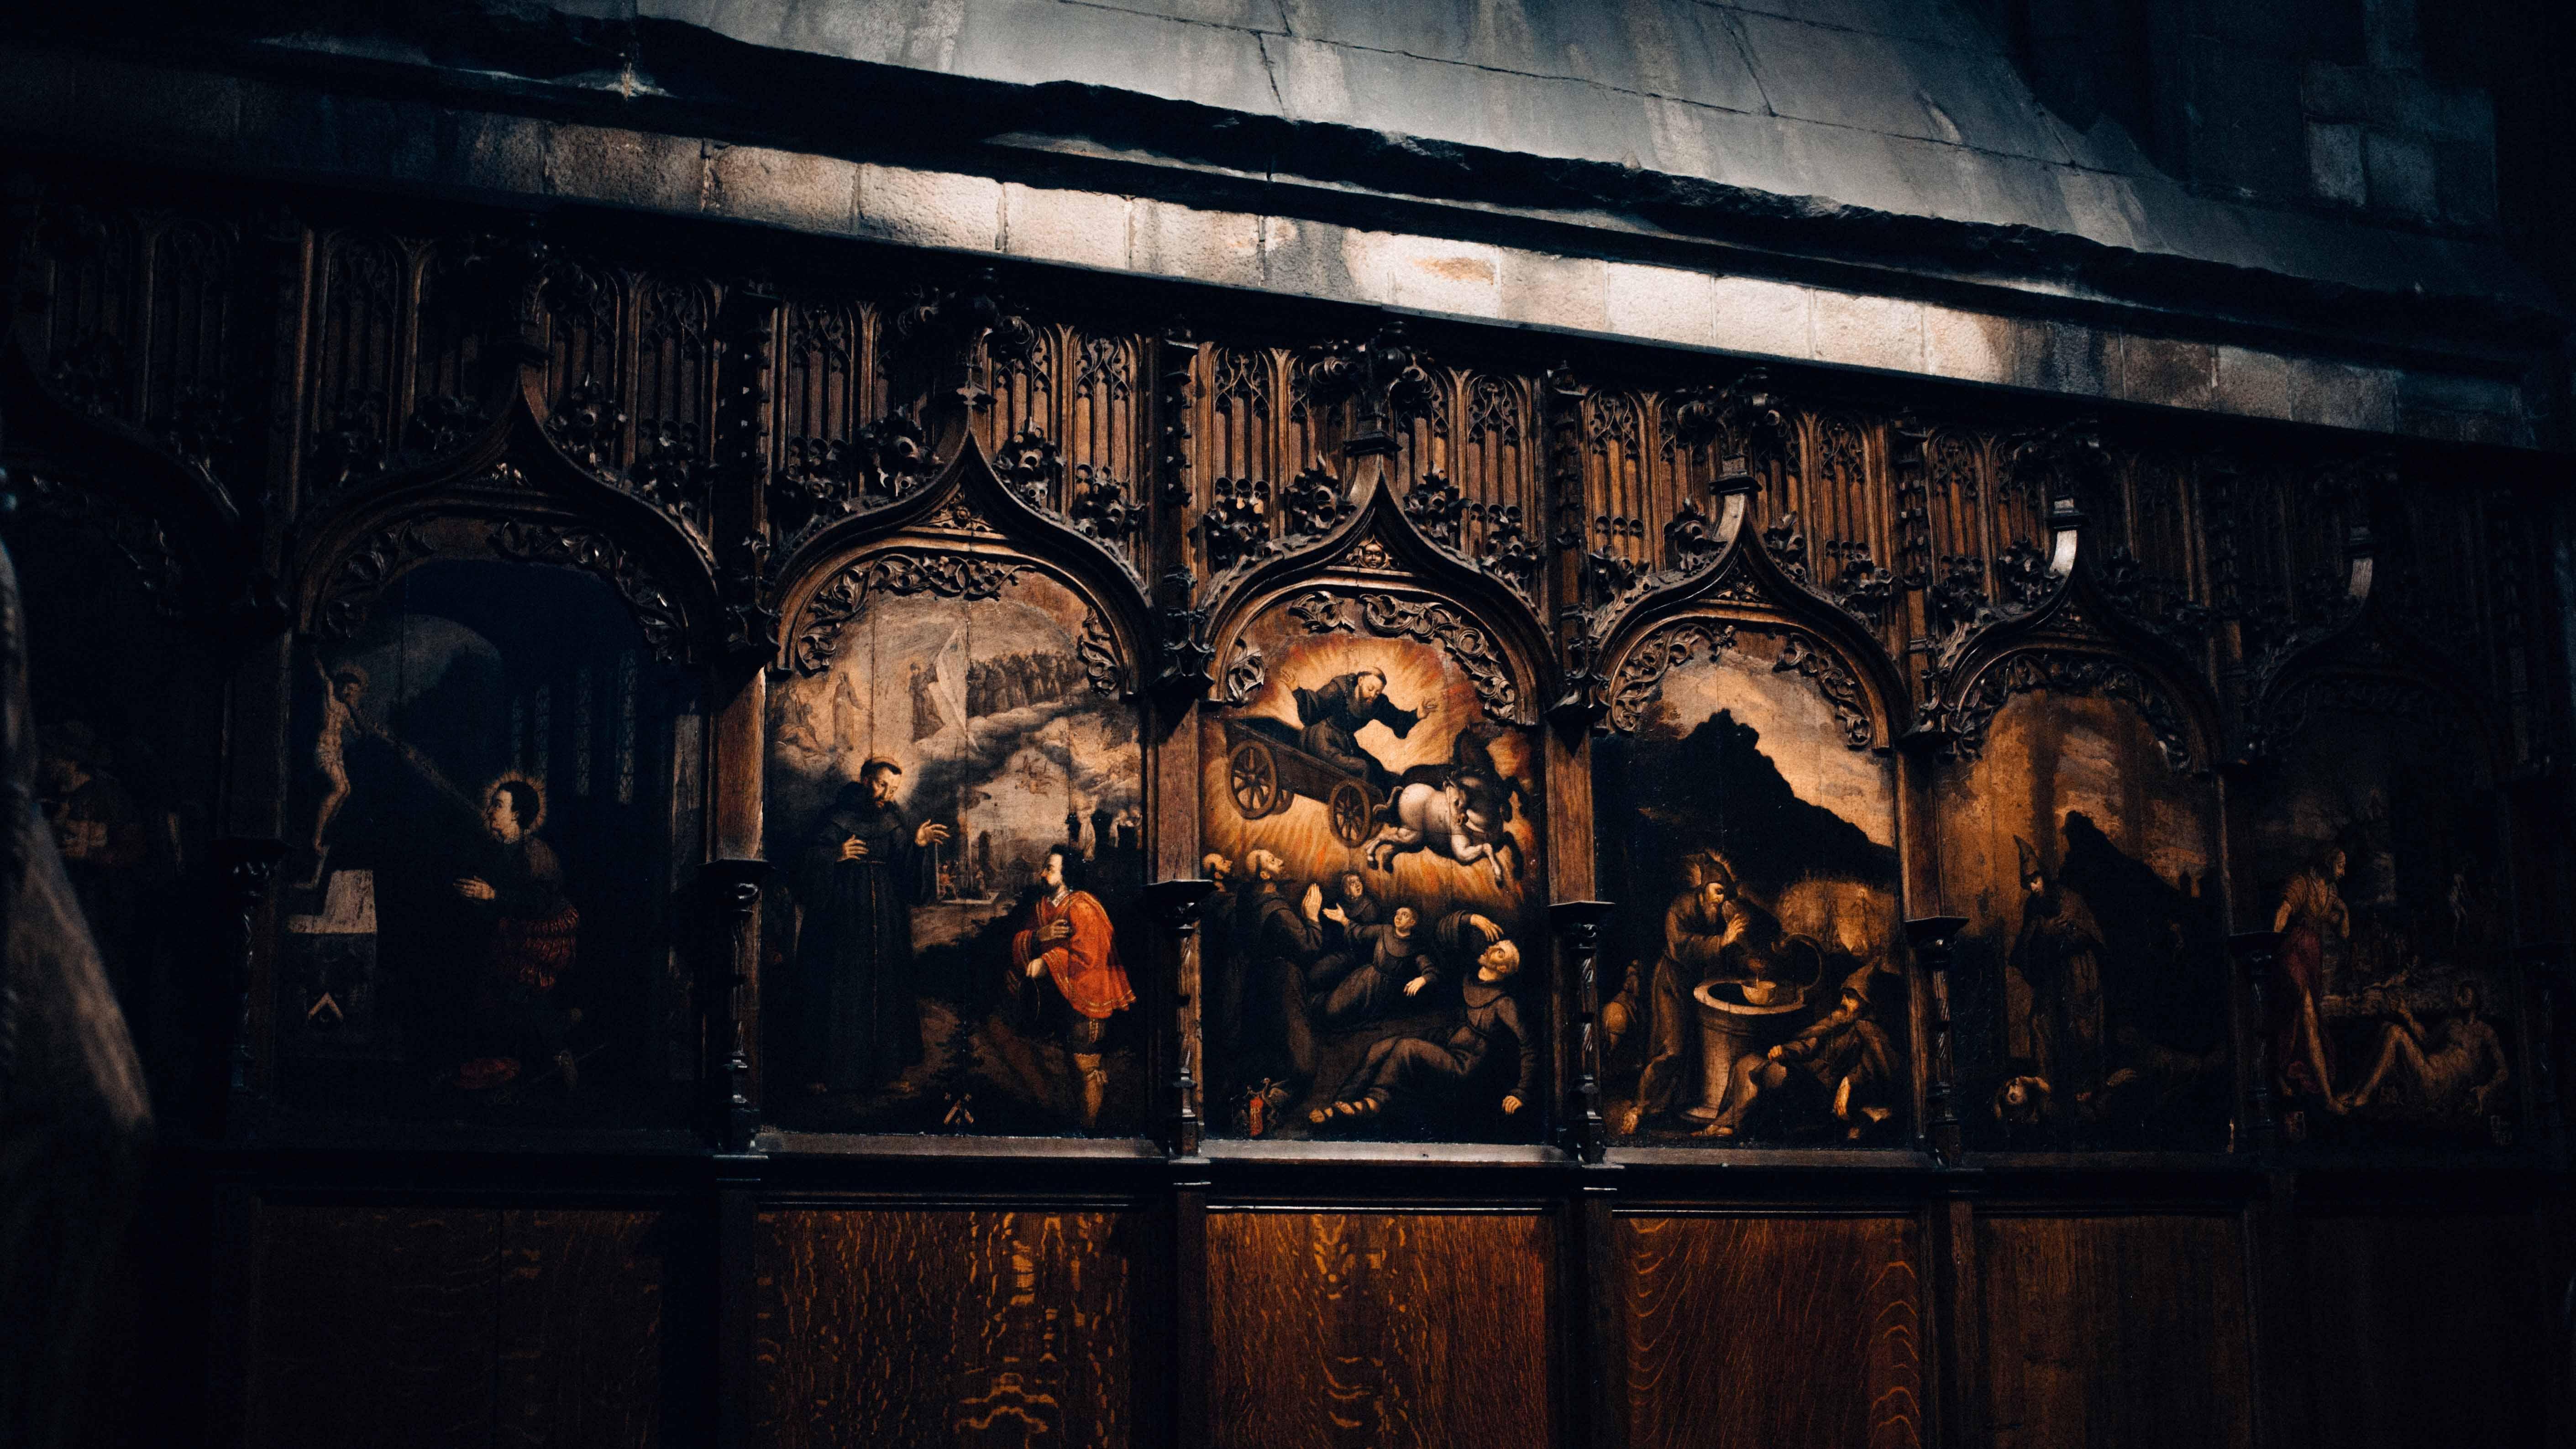 Sainte waudru mons